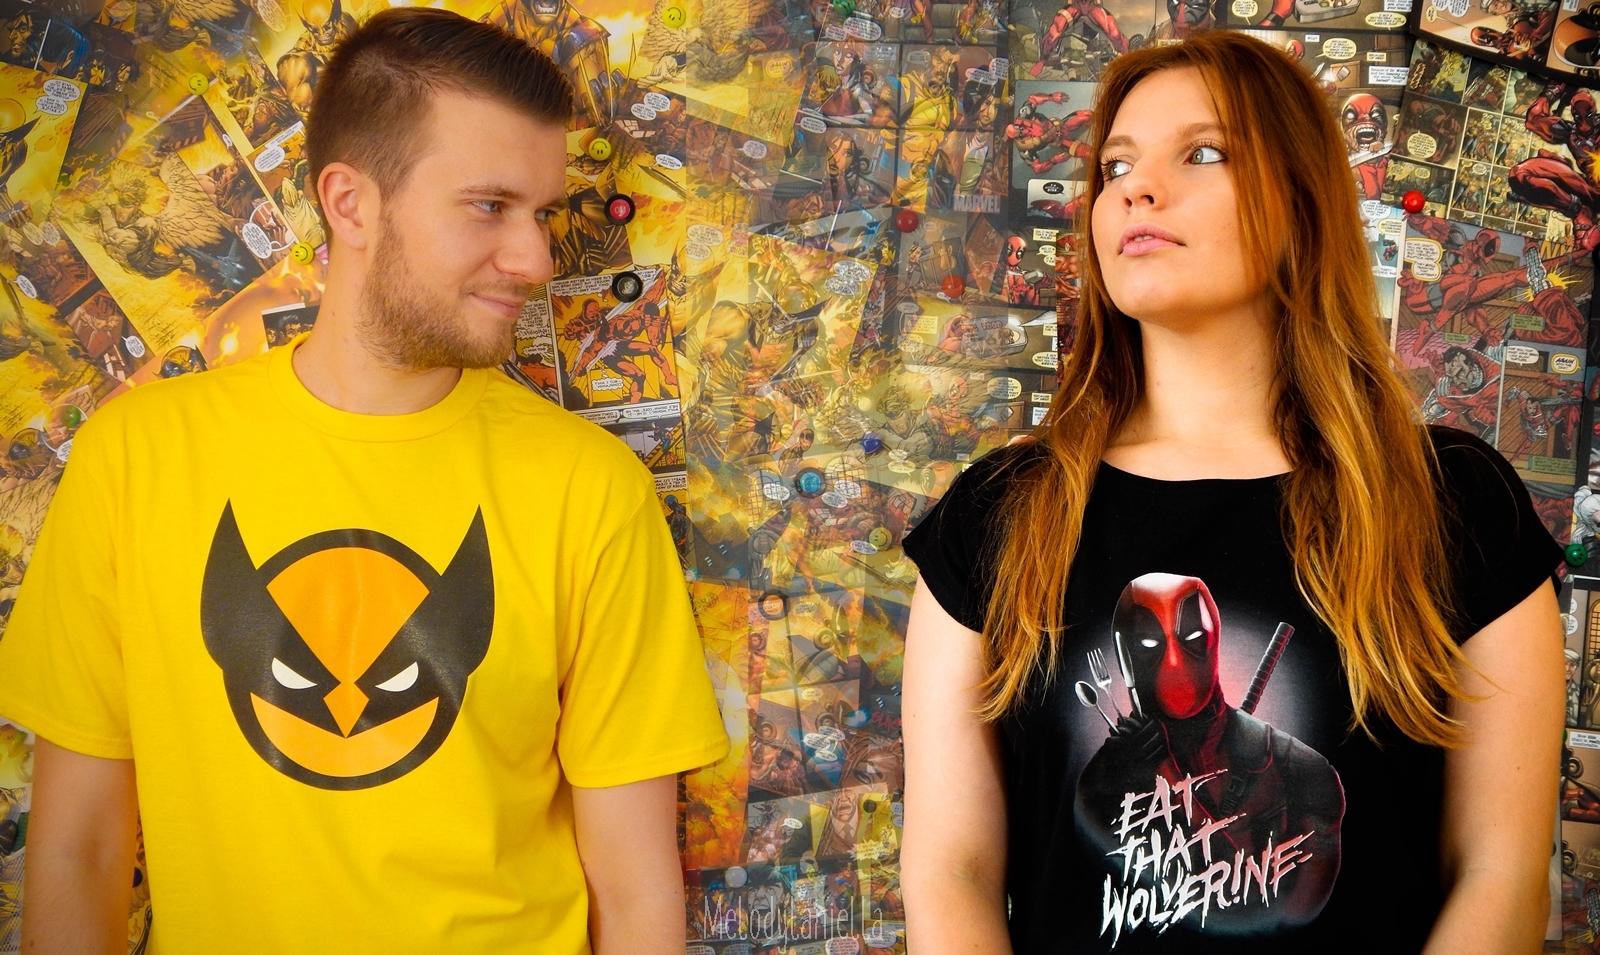 1 koszulkowo melodylaniella koszulki geek wolverine deadpool komiksy comisc ubrania dla par style fashion look